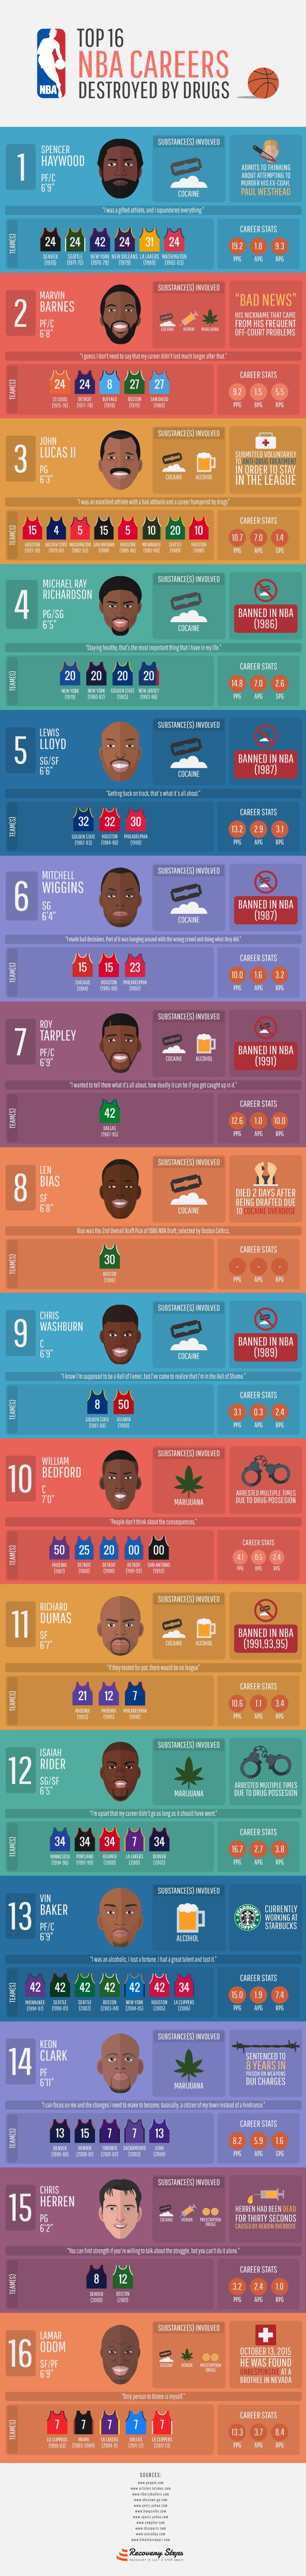 Top 16 NBA Careers Destroyed by Drugs